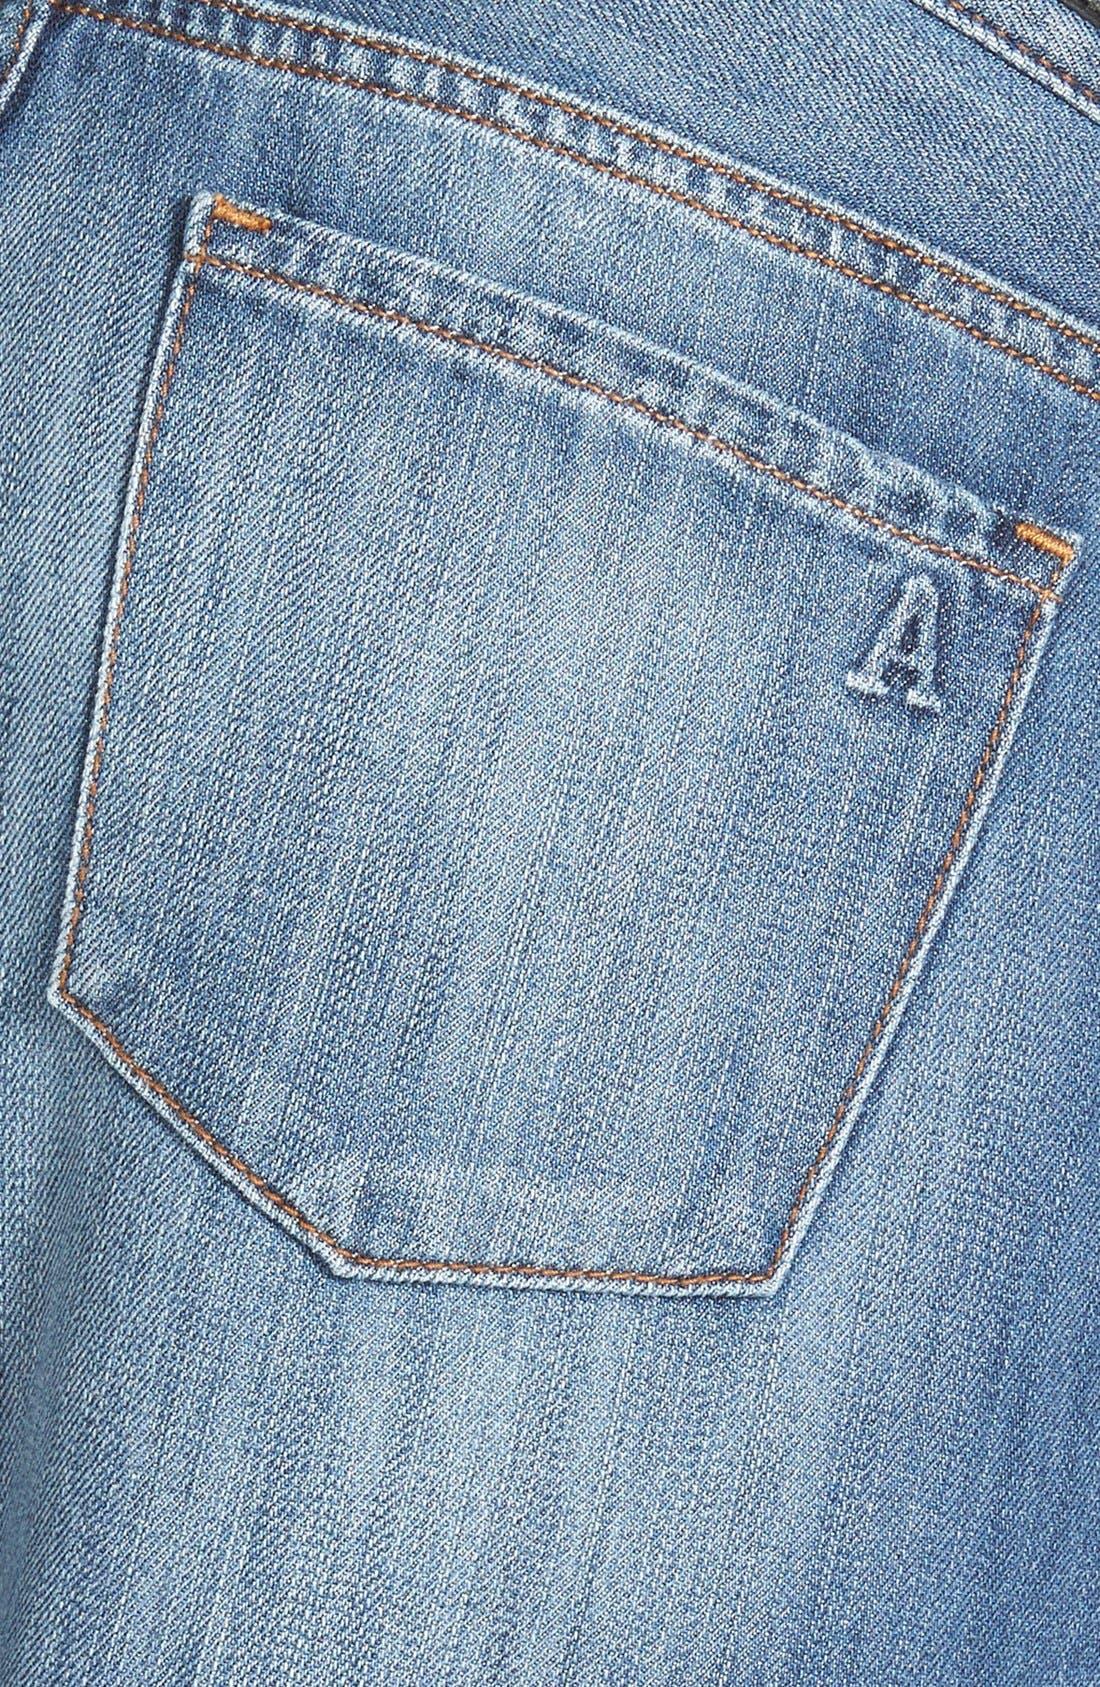 Alternate Image 3  - Articles of Society 'Cindy' Boyfriend Jeans (Medium Wash)